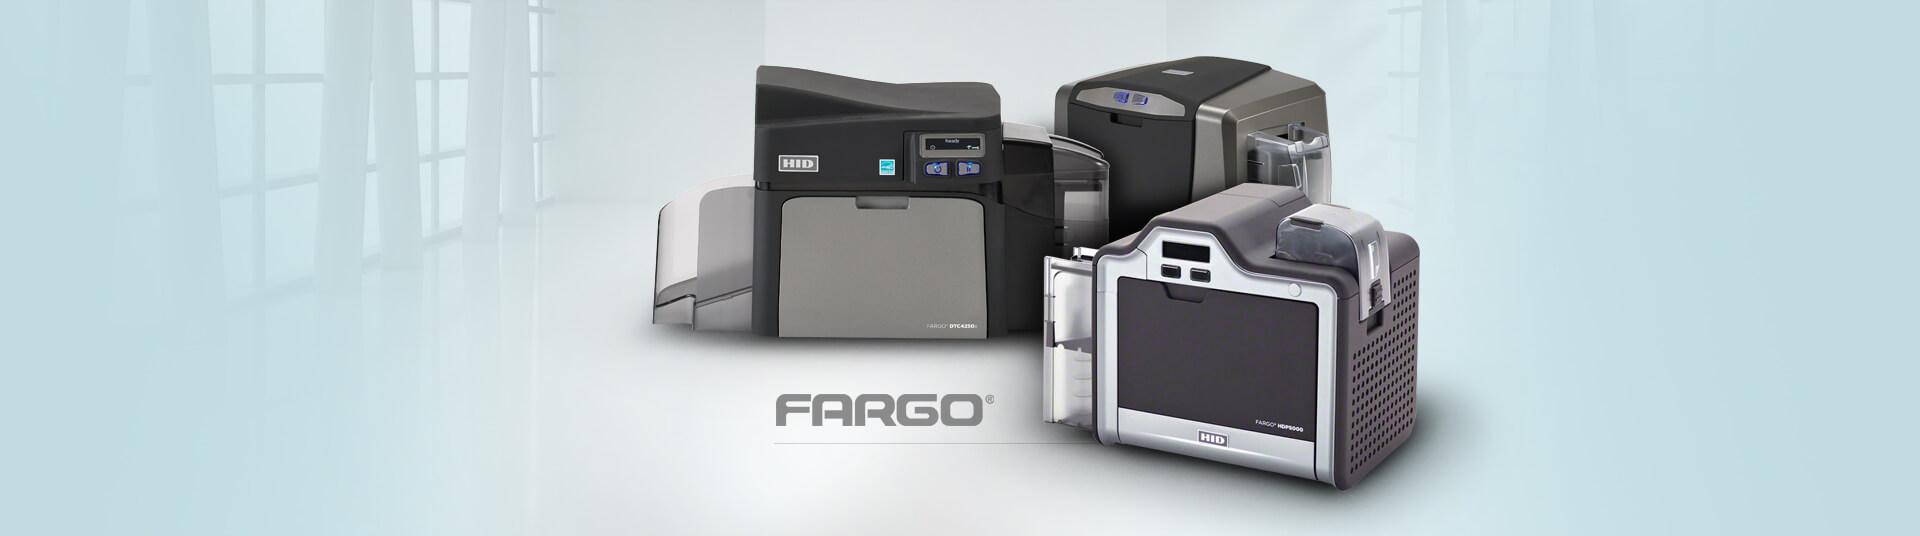 fargo id badge maker fargo id badge makers for secure ids alphacard